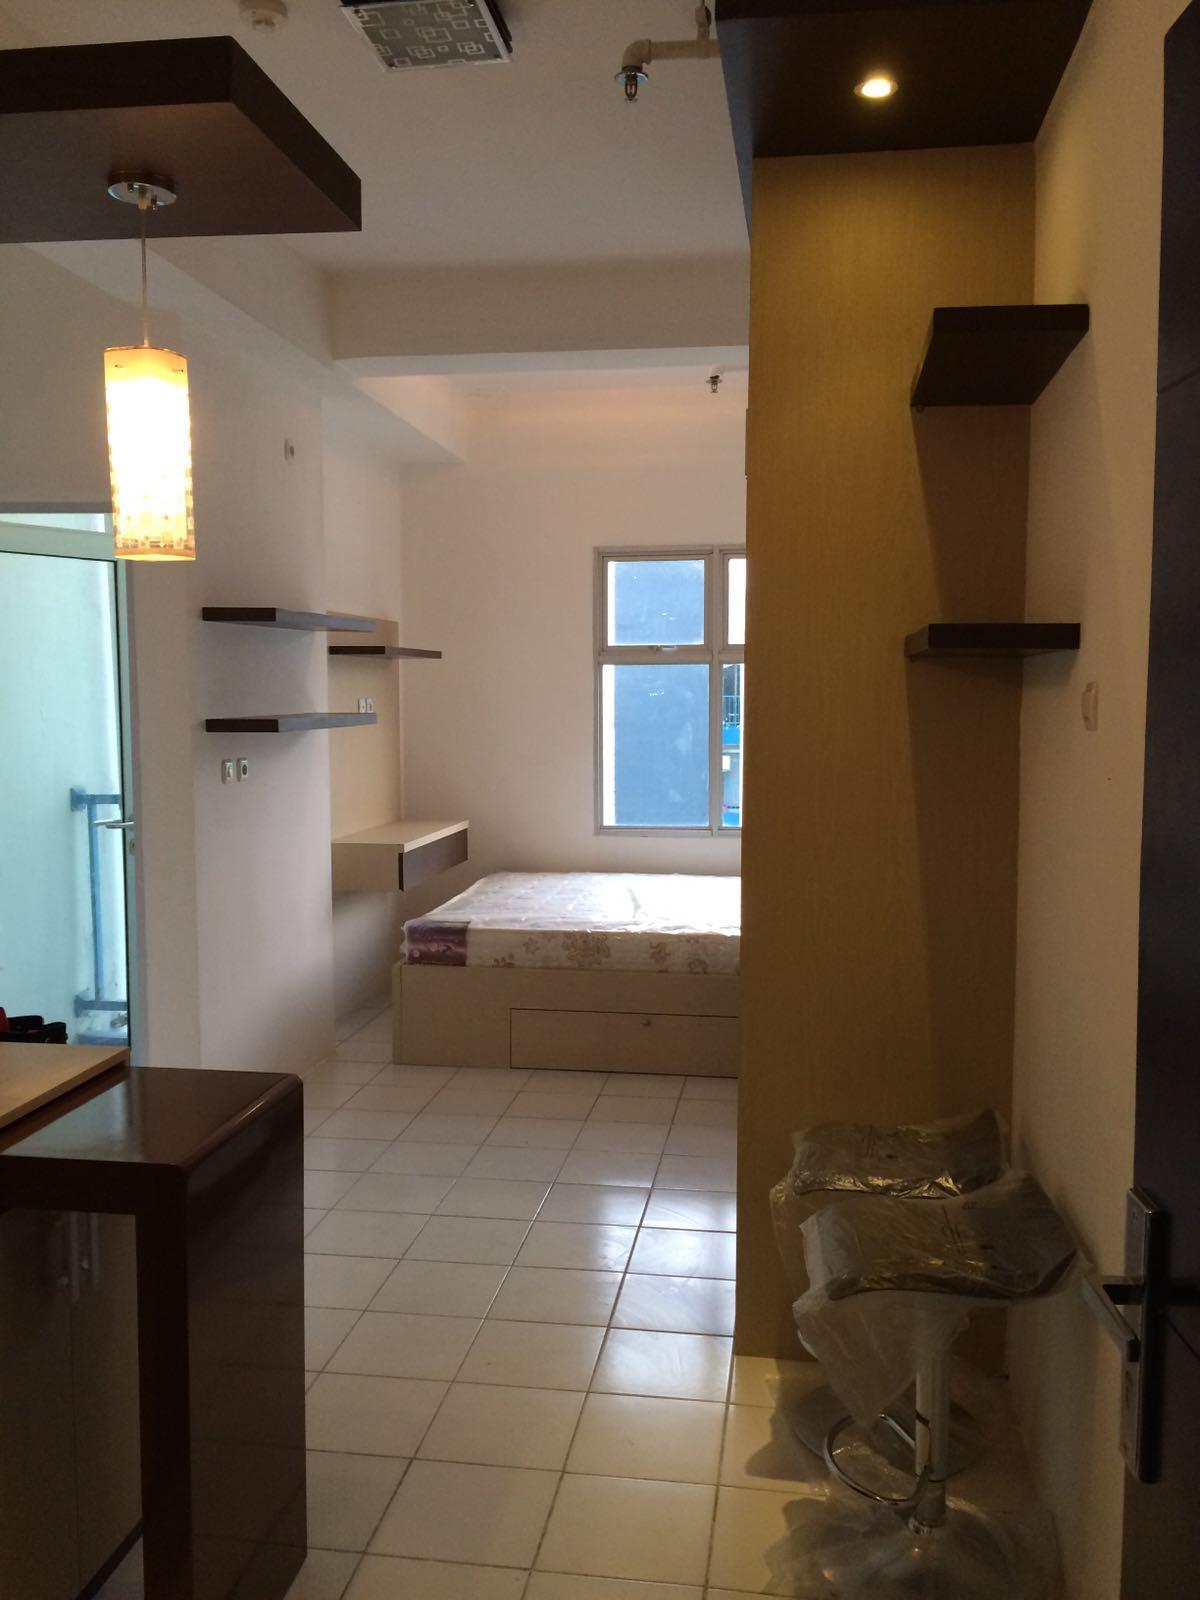 Gambar interior apartemen type studio infinity interior jakarta - Gambar interior design ...